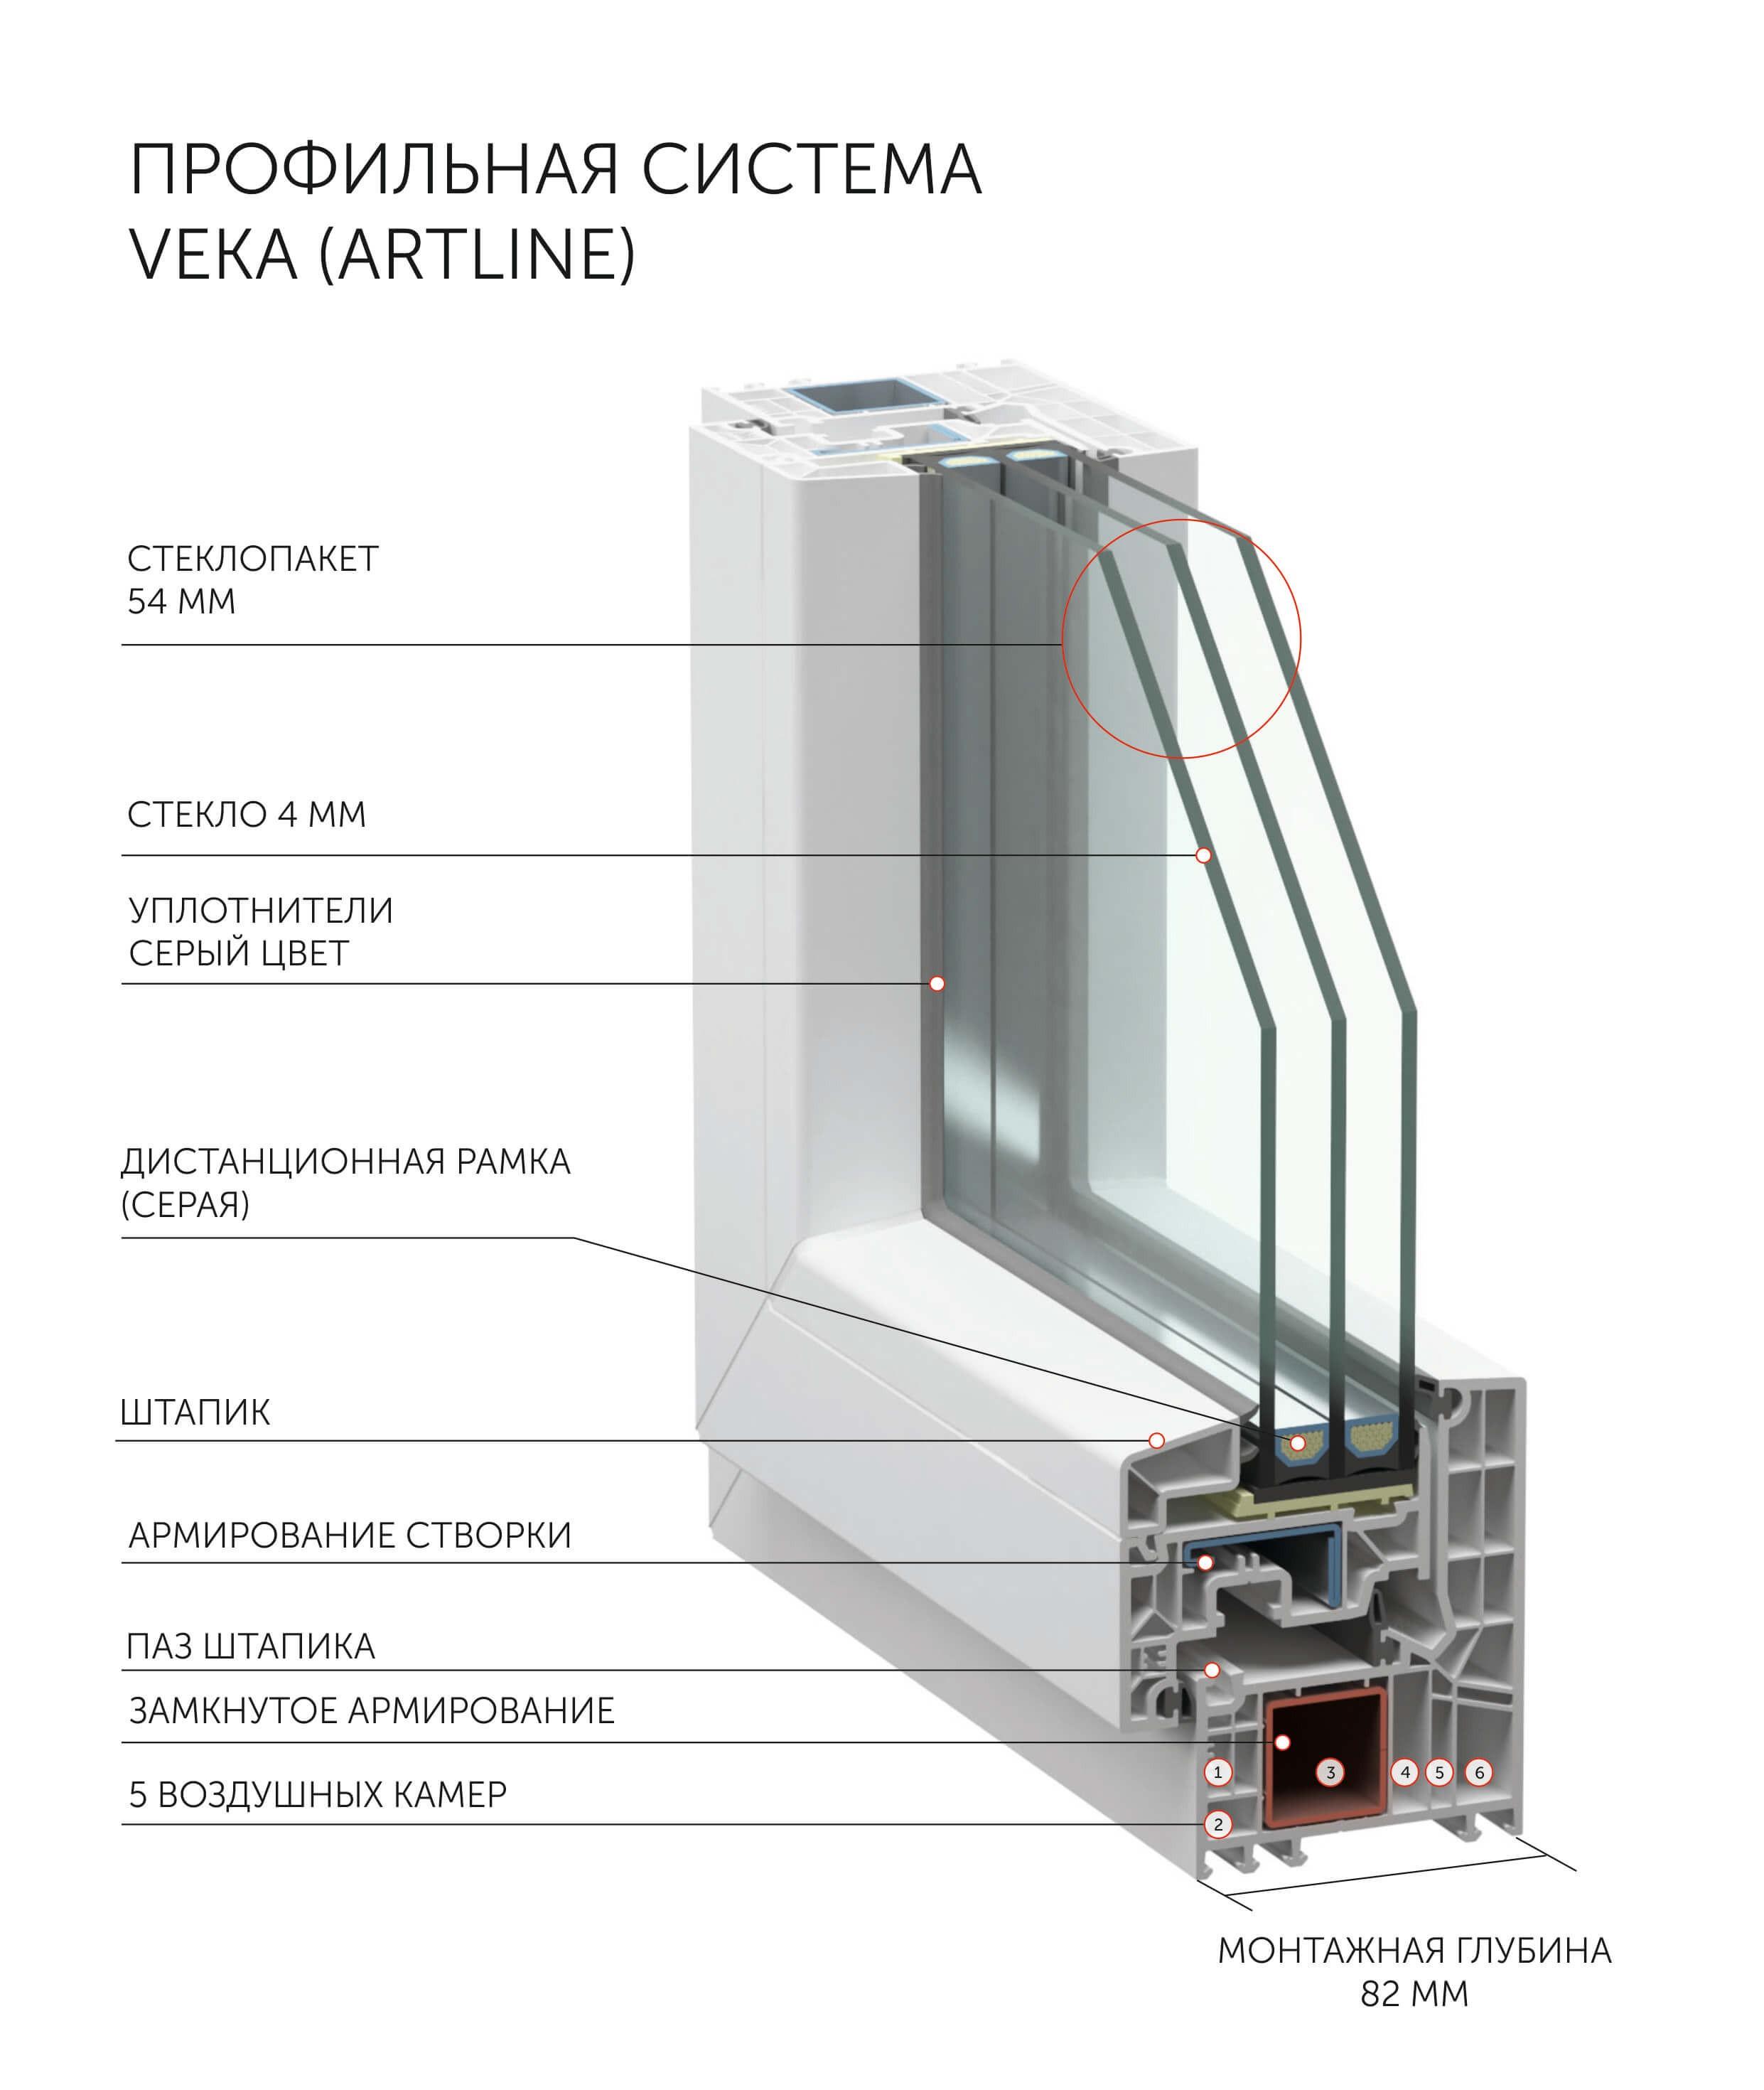 Производстве пластиковых окон